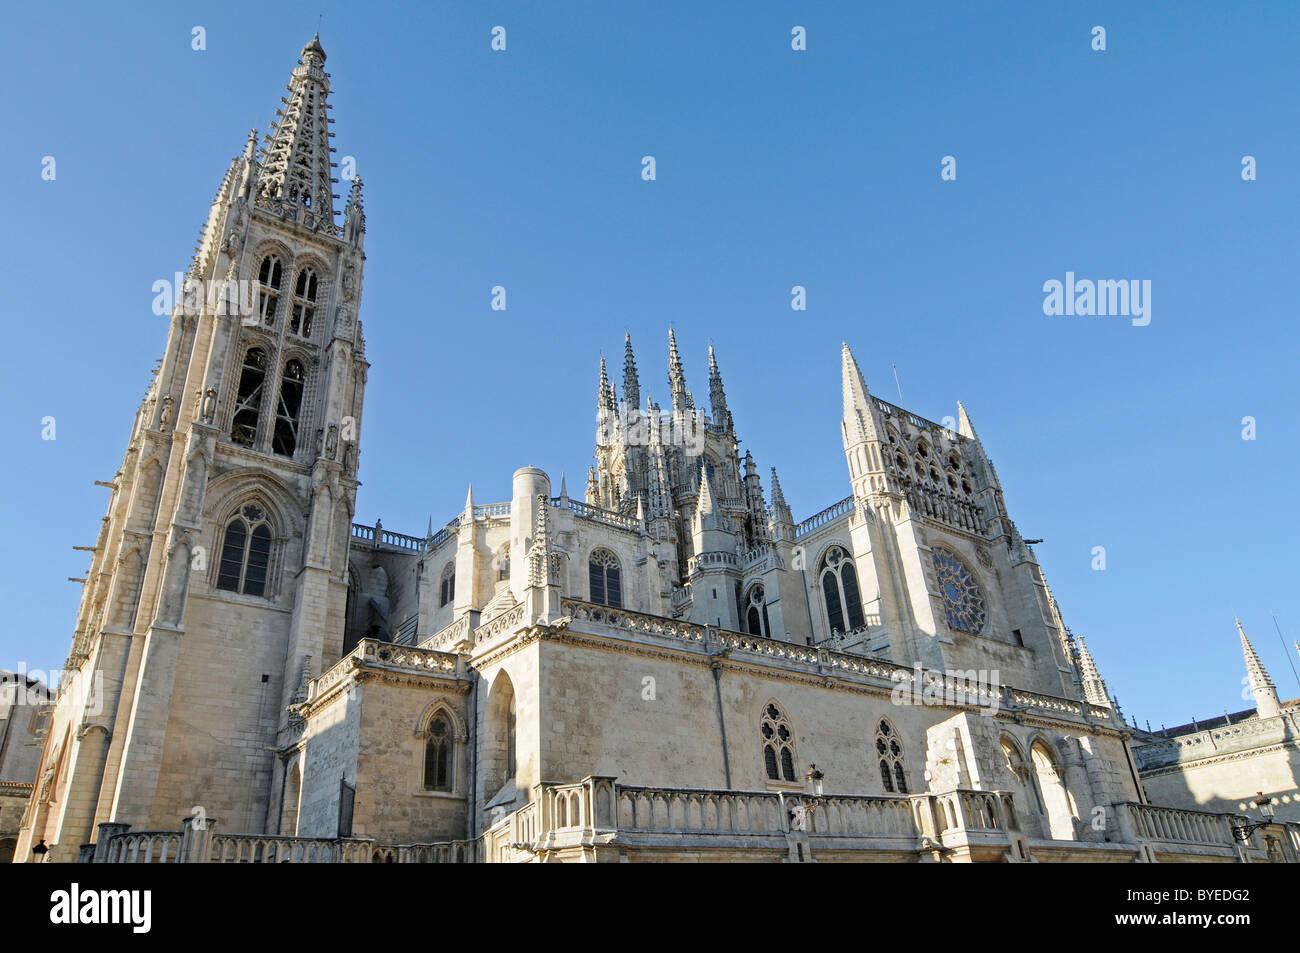 Gothic Cathedral of Burgos, Burgos, Castilla y Leon province, Spain, Europe - Stock Image